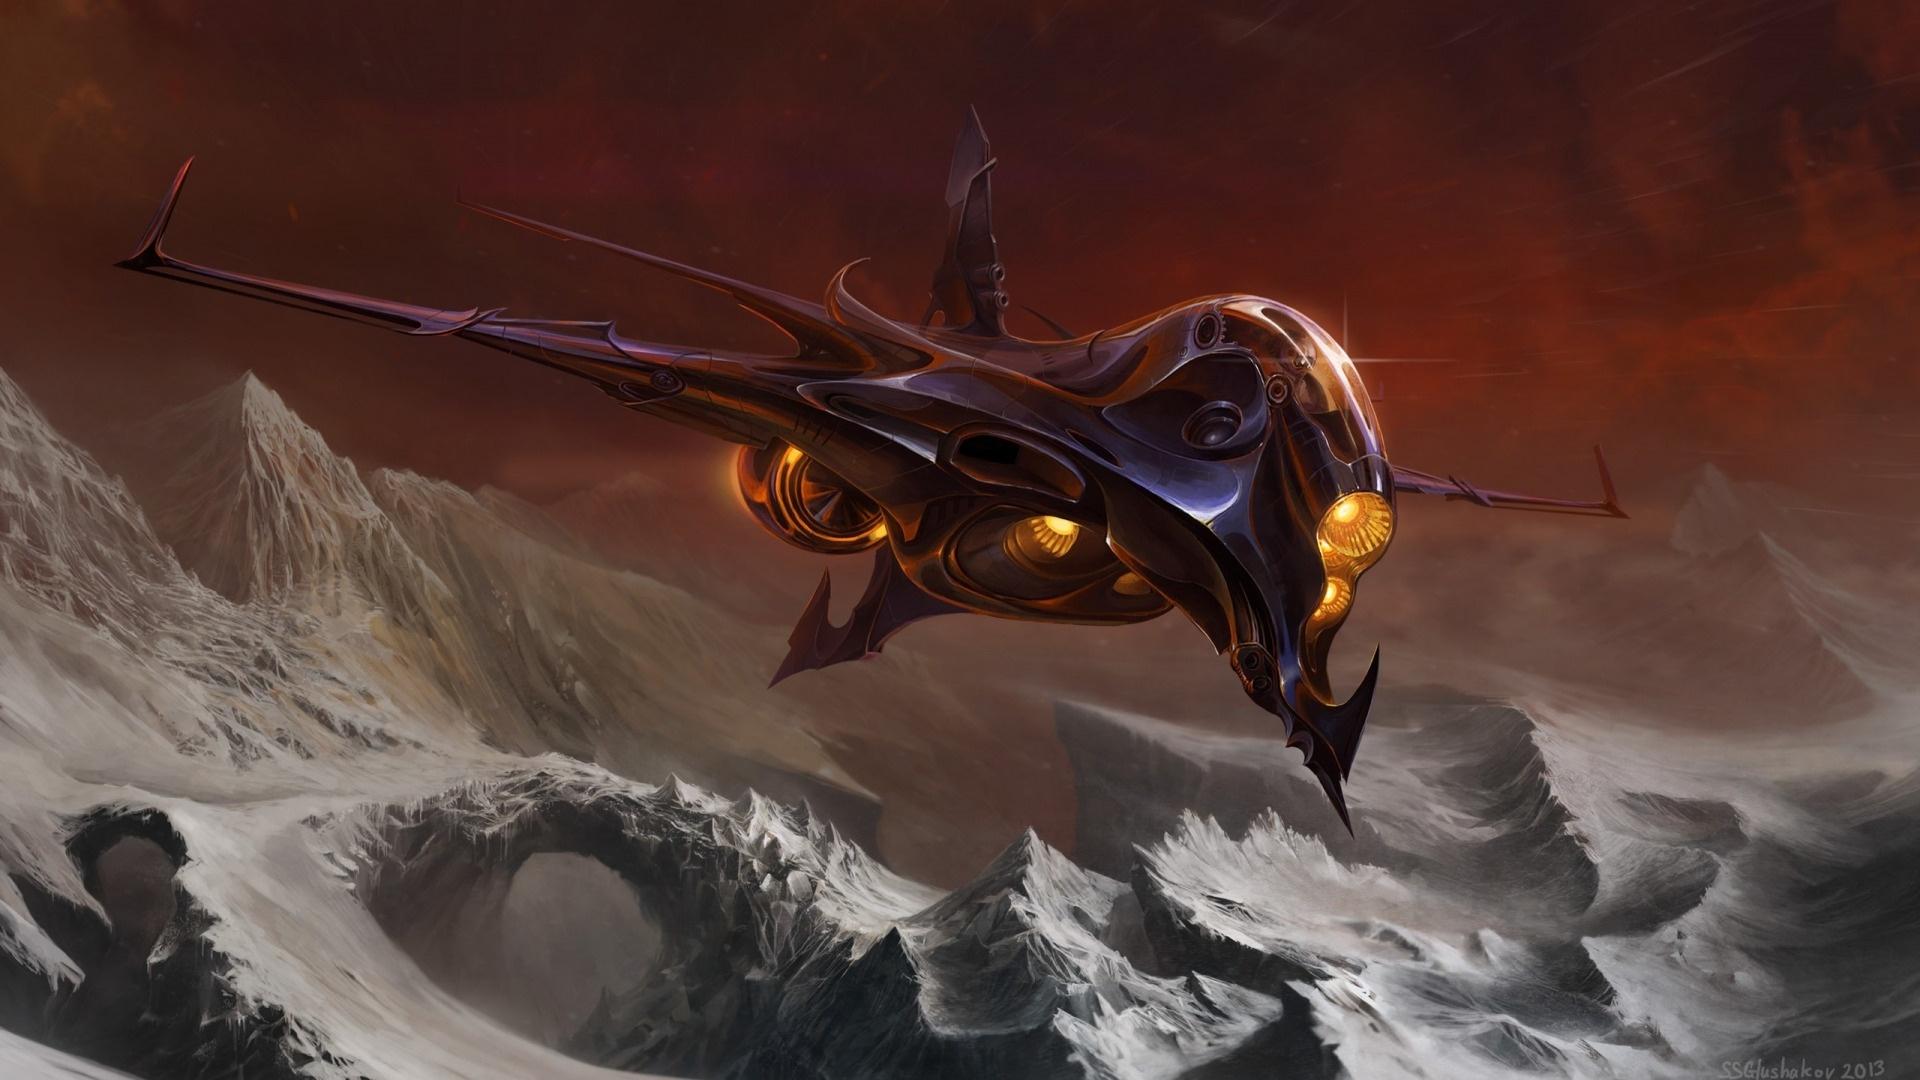 Spaceships Art wallpaper for desktop